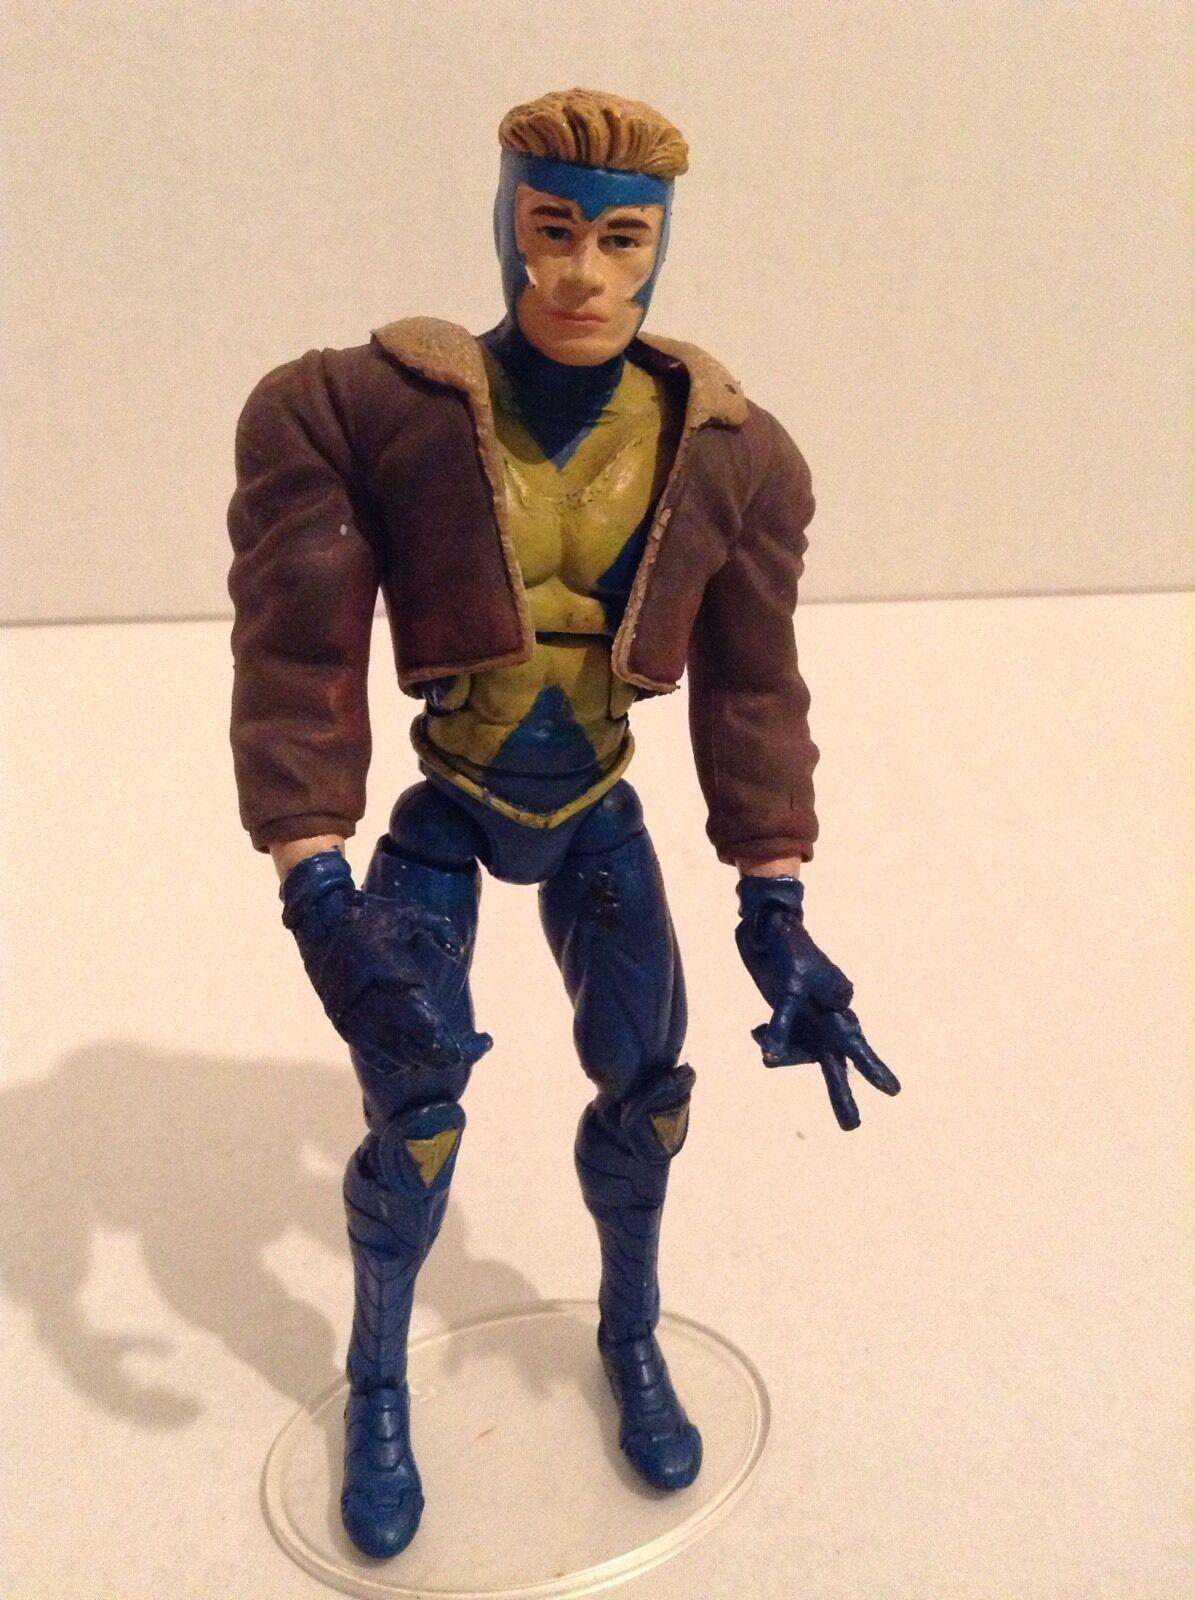 Marvel Havok Action Figure Toy